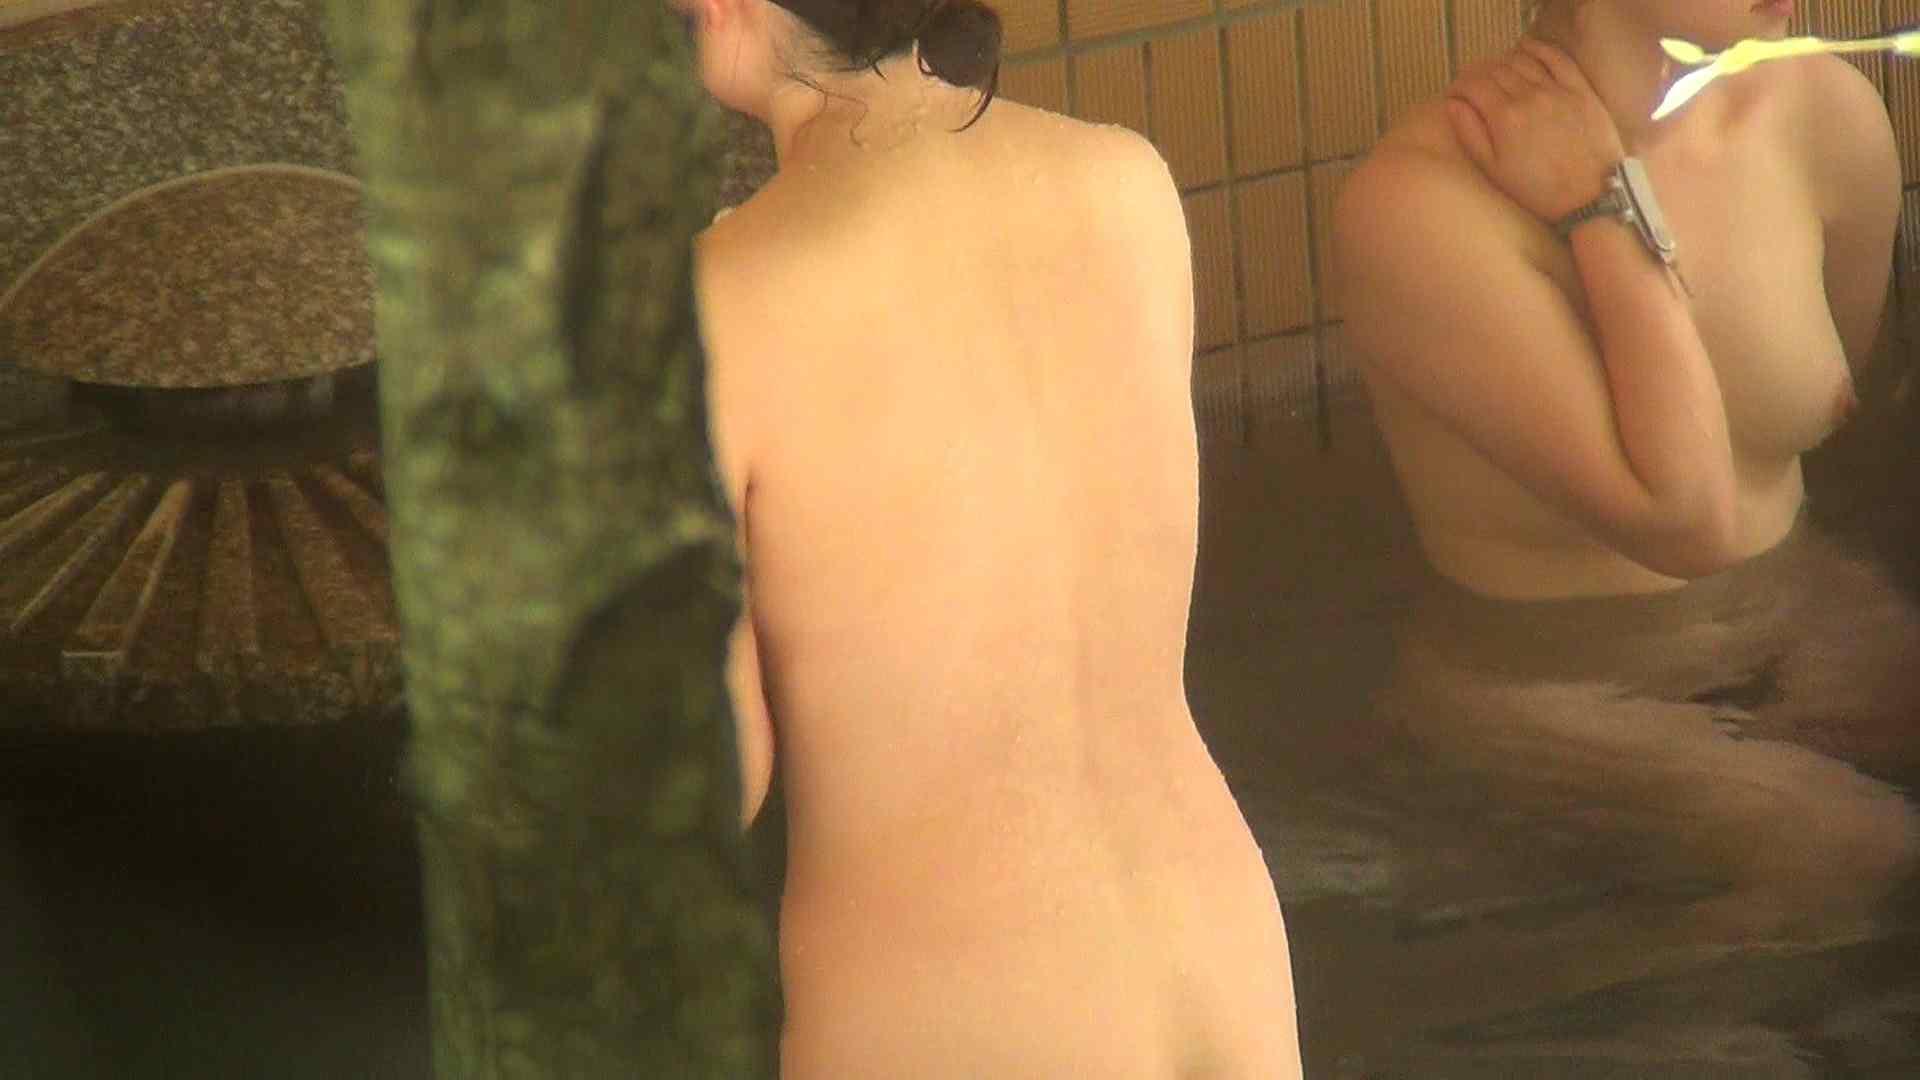 Aquaな露天風呂Vol.301 OLのエロ生活 すけべAV動画紹介 112連発 71